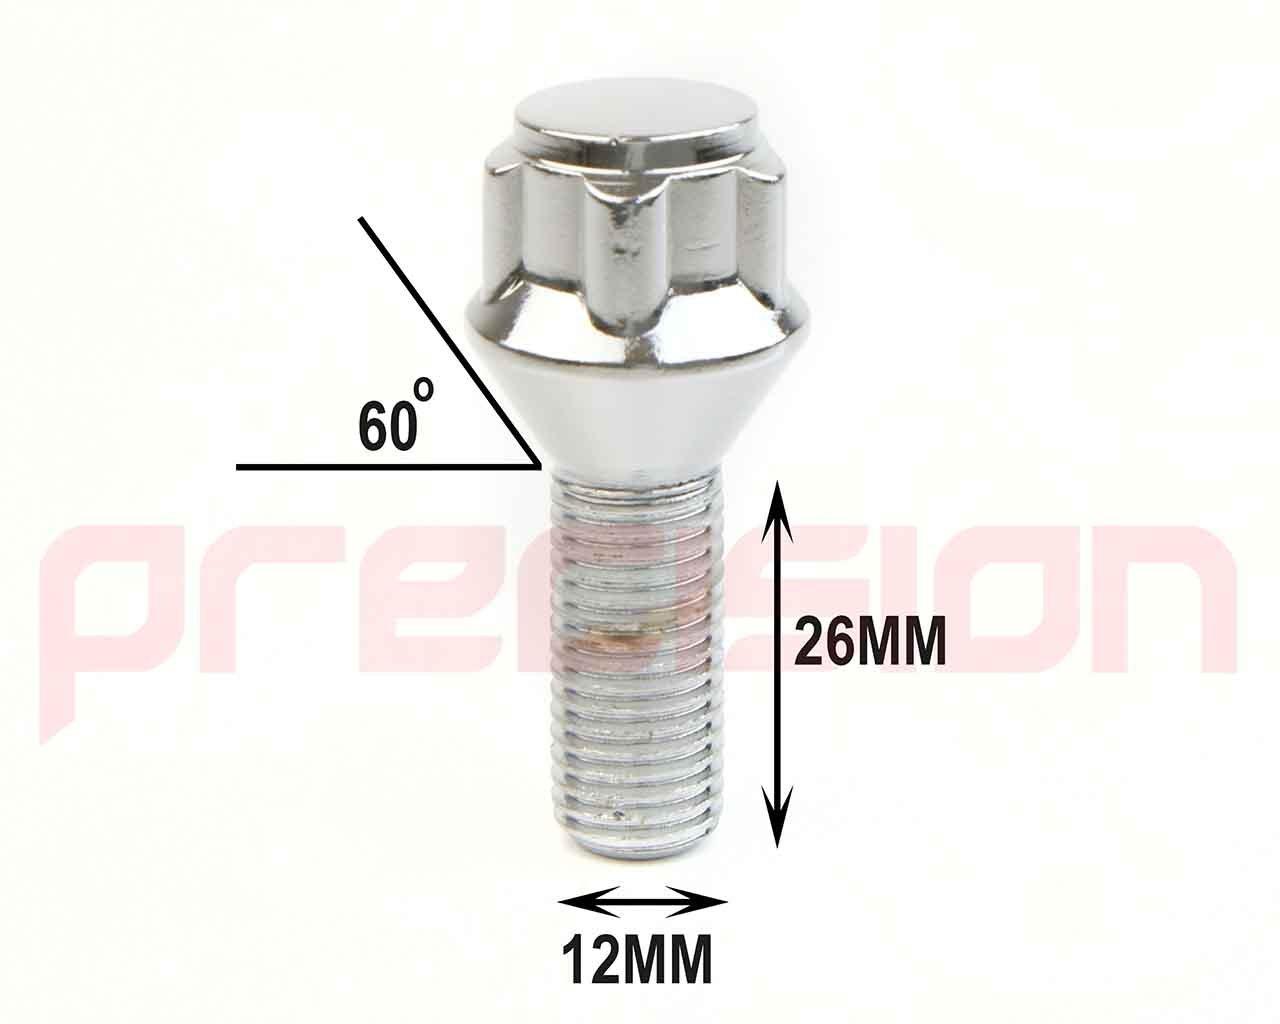 Butzi 12x1.5 Chrome Anti Theft Locking Wheel Bolt Nuts /& 2 Keys for Toyota Prius